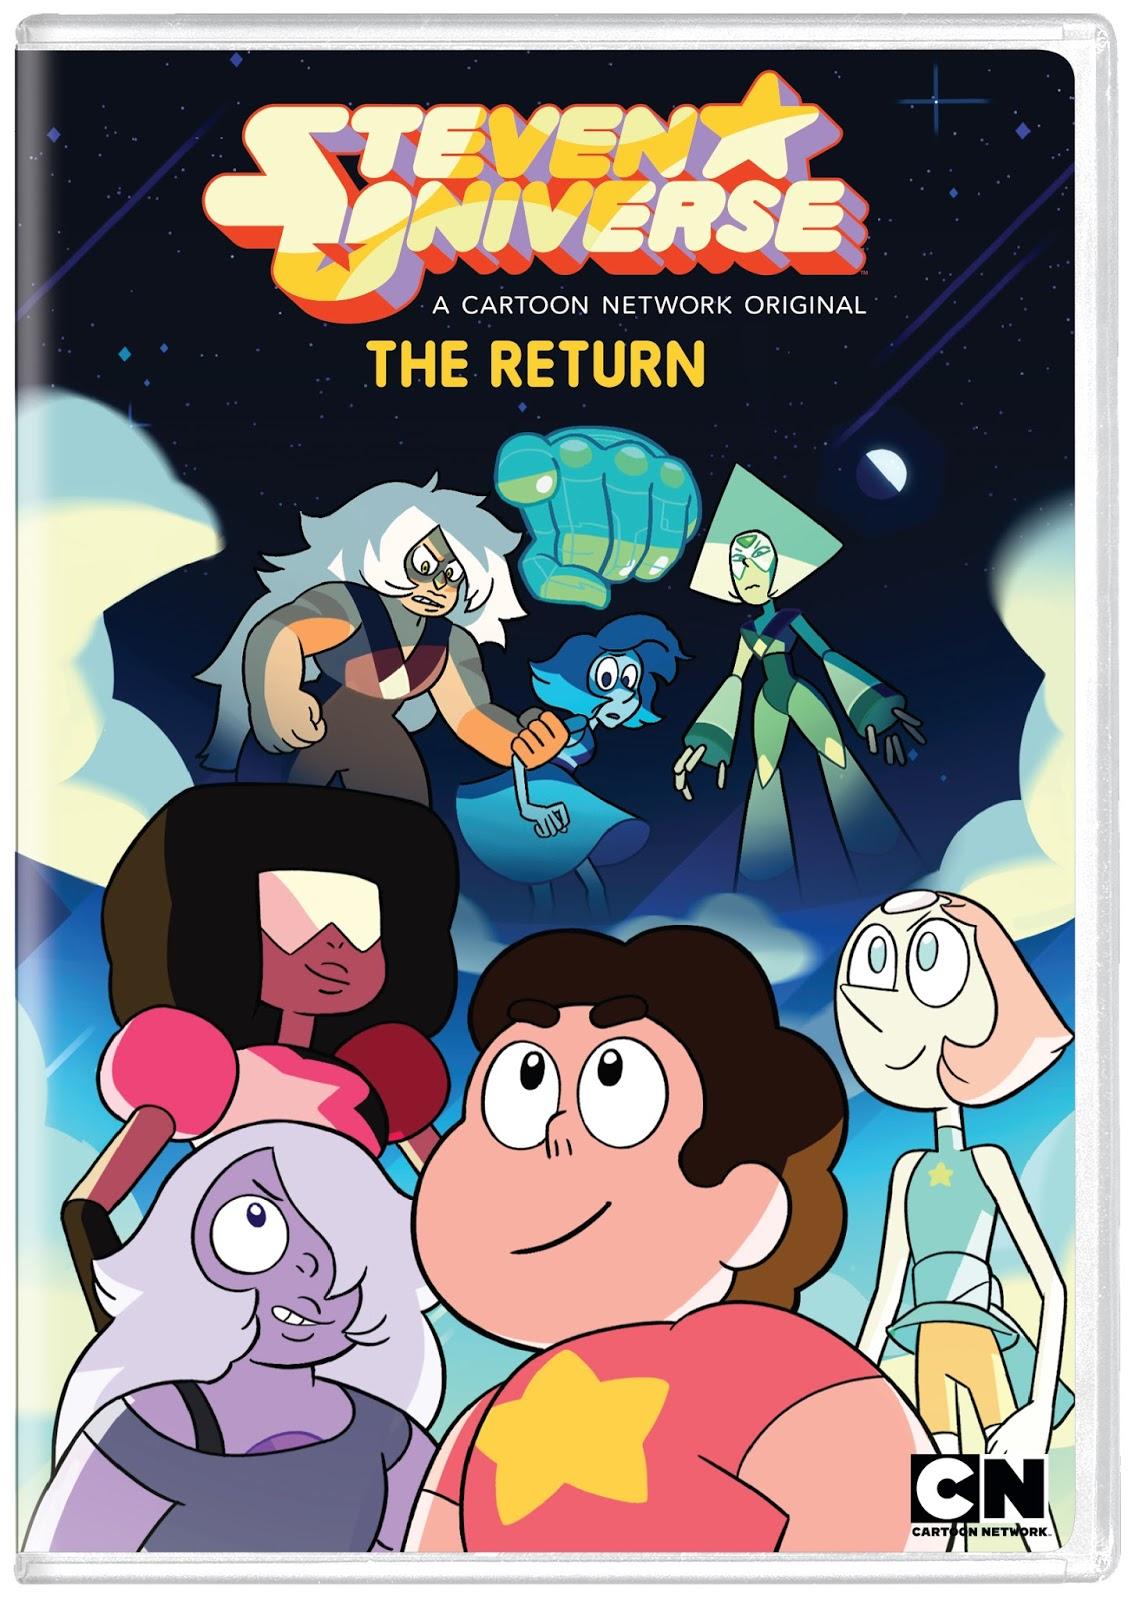 e60f54a5e5c9 Steven Universe  The Return on DVD